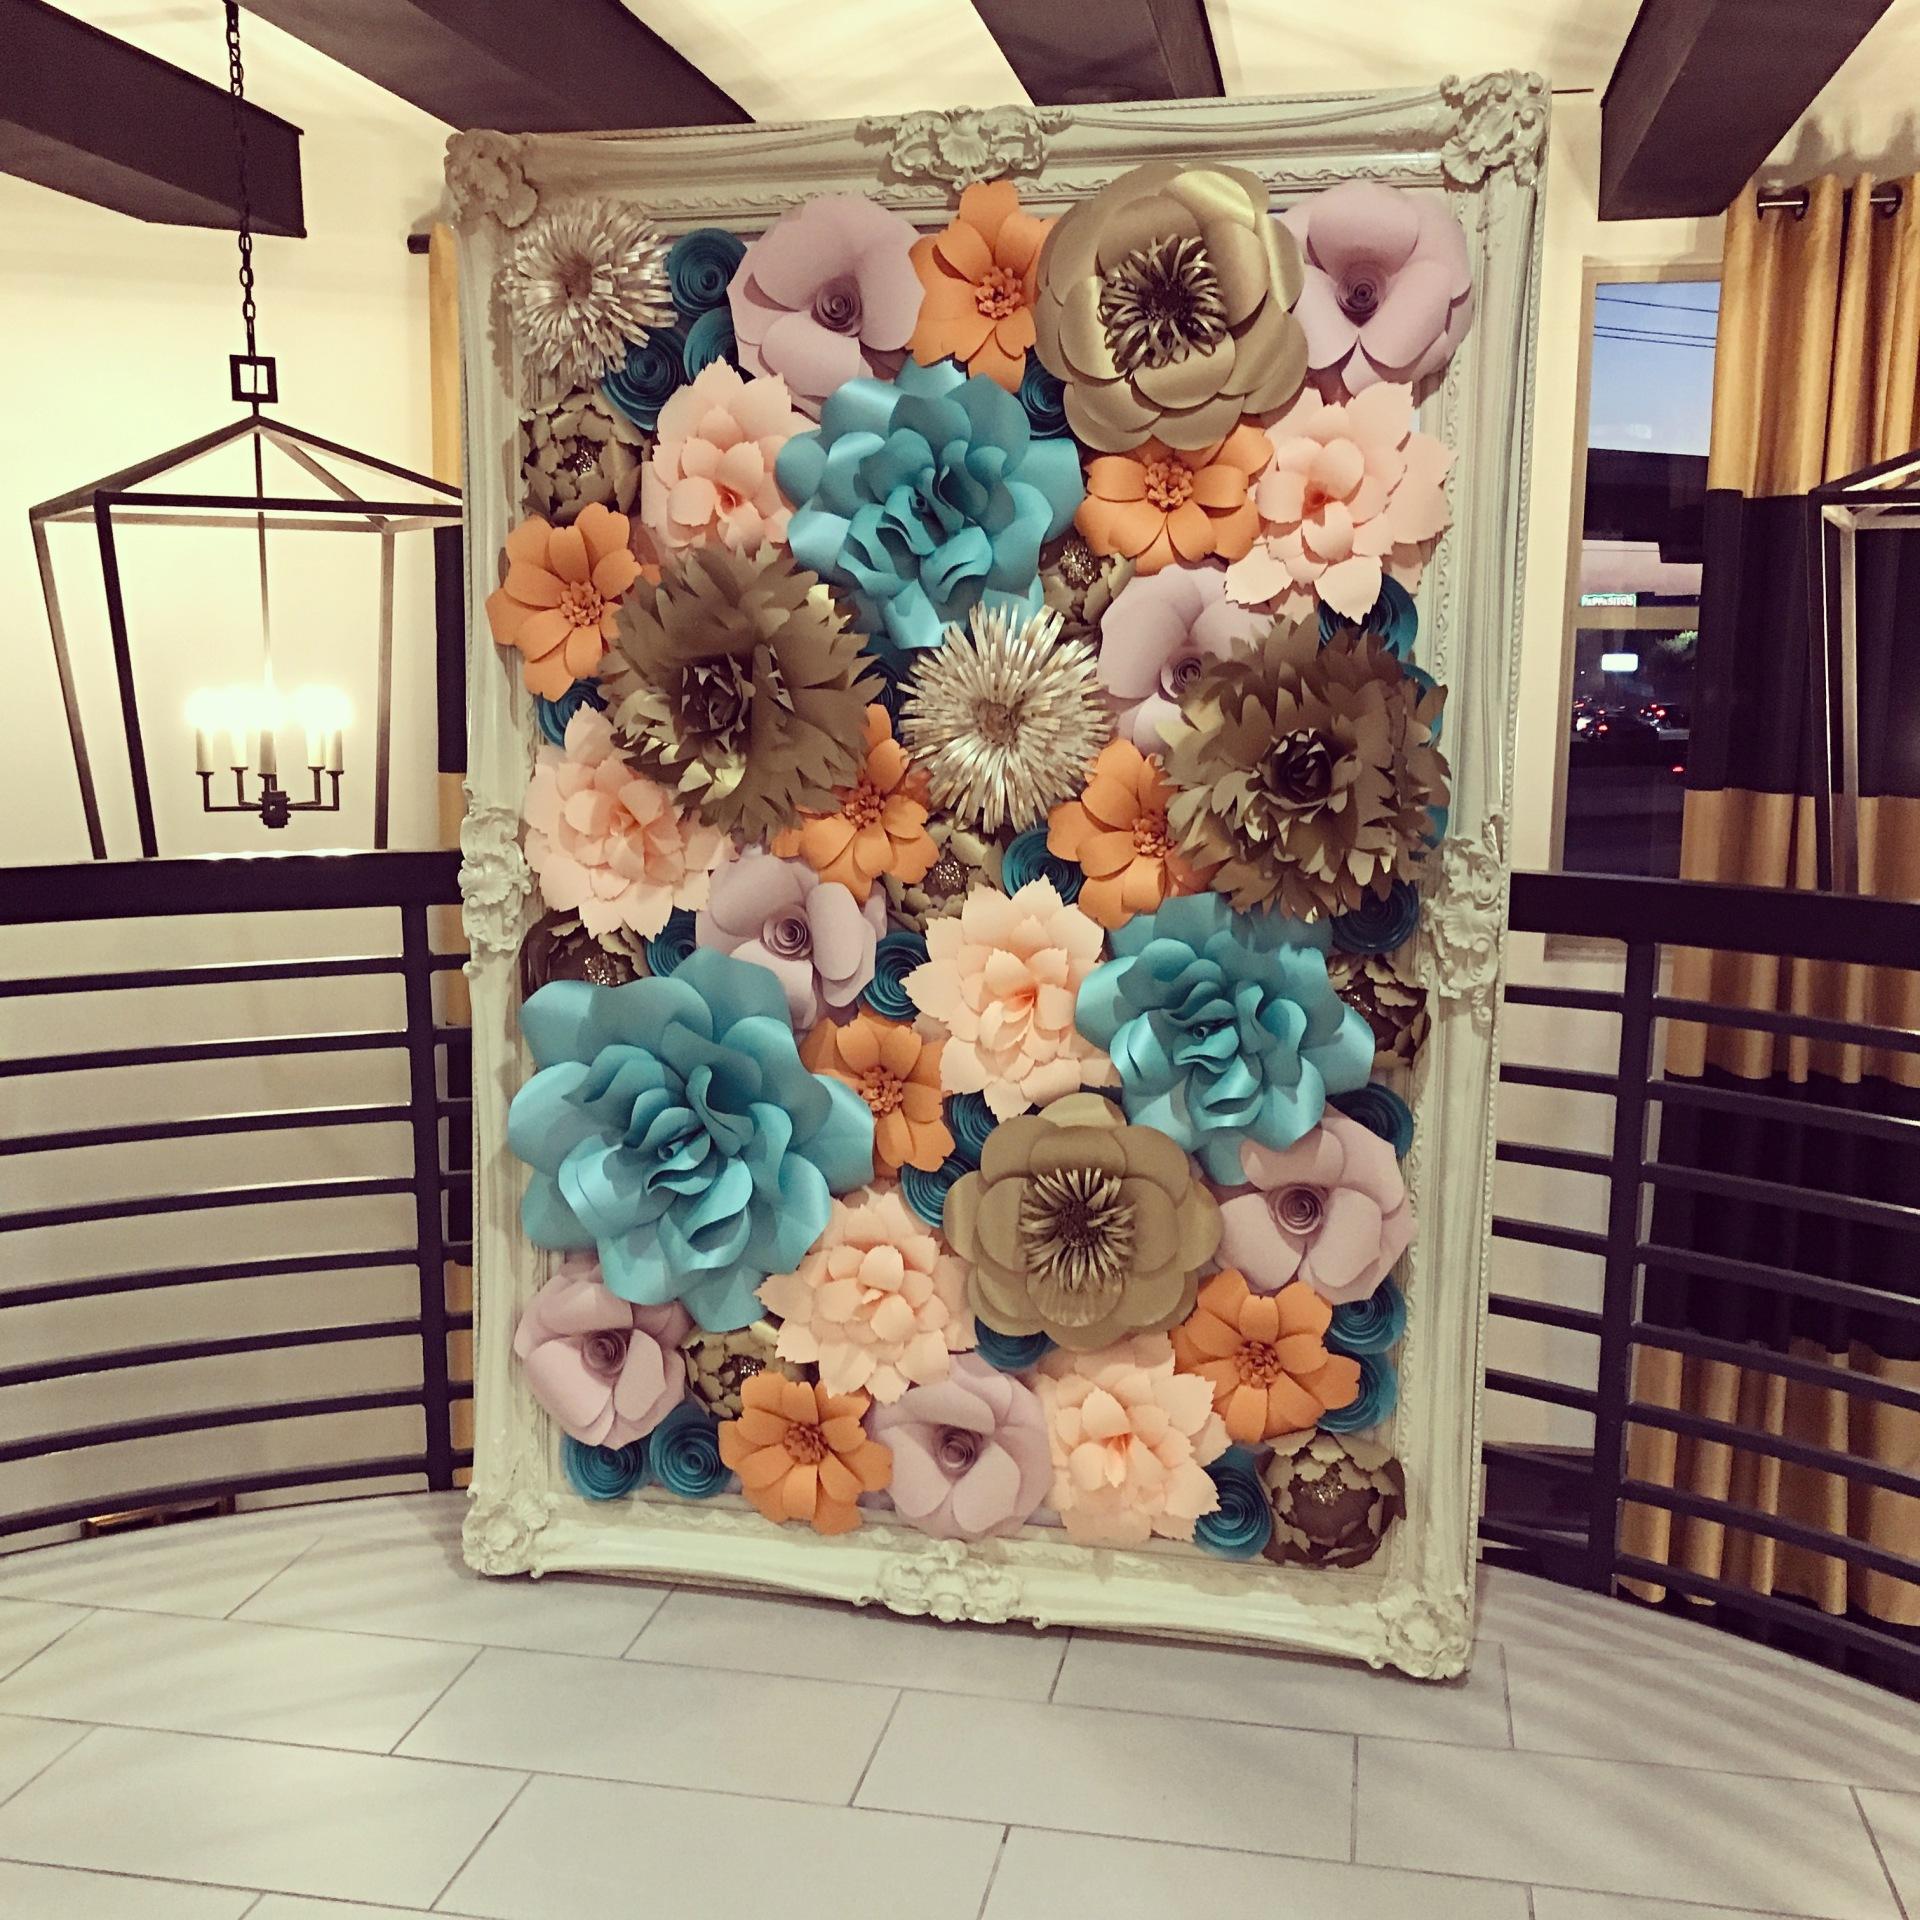 Event decor, wedding, wedding decor, HOUSTON wedding rental, corporate events, quinceanera, bridal shower, baby shower, photo backdrop, Houston Paper Flowers,